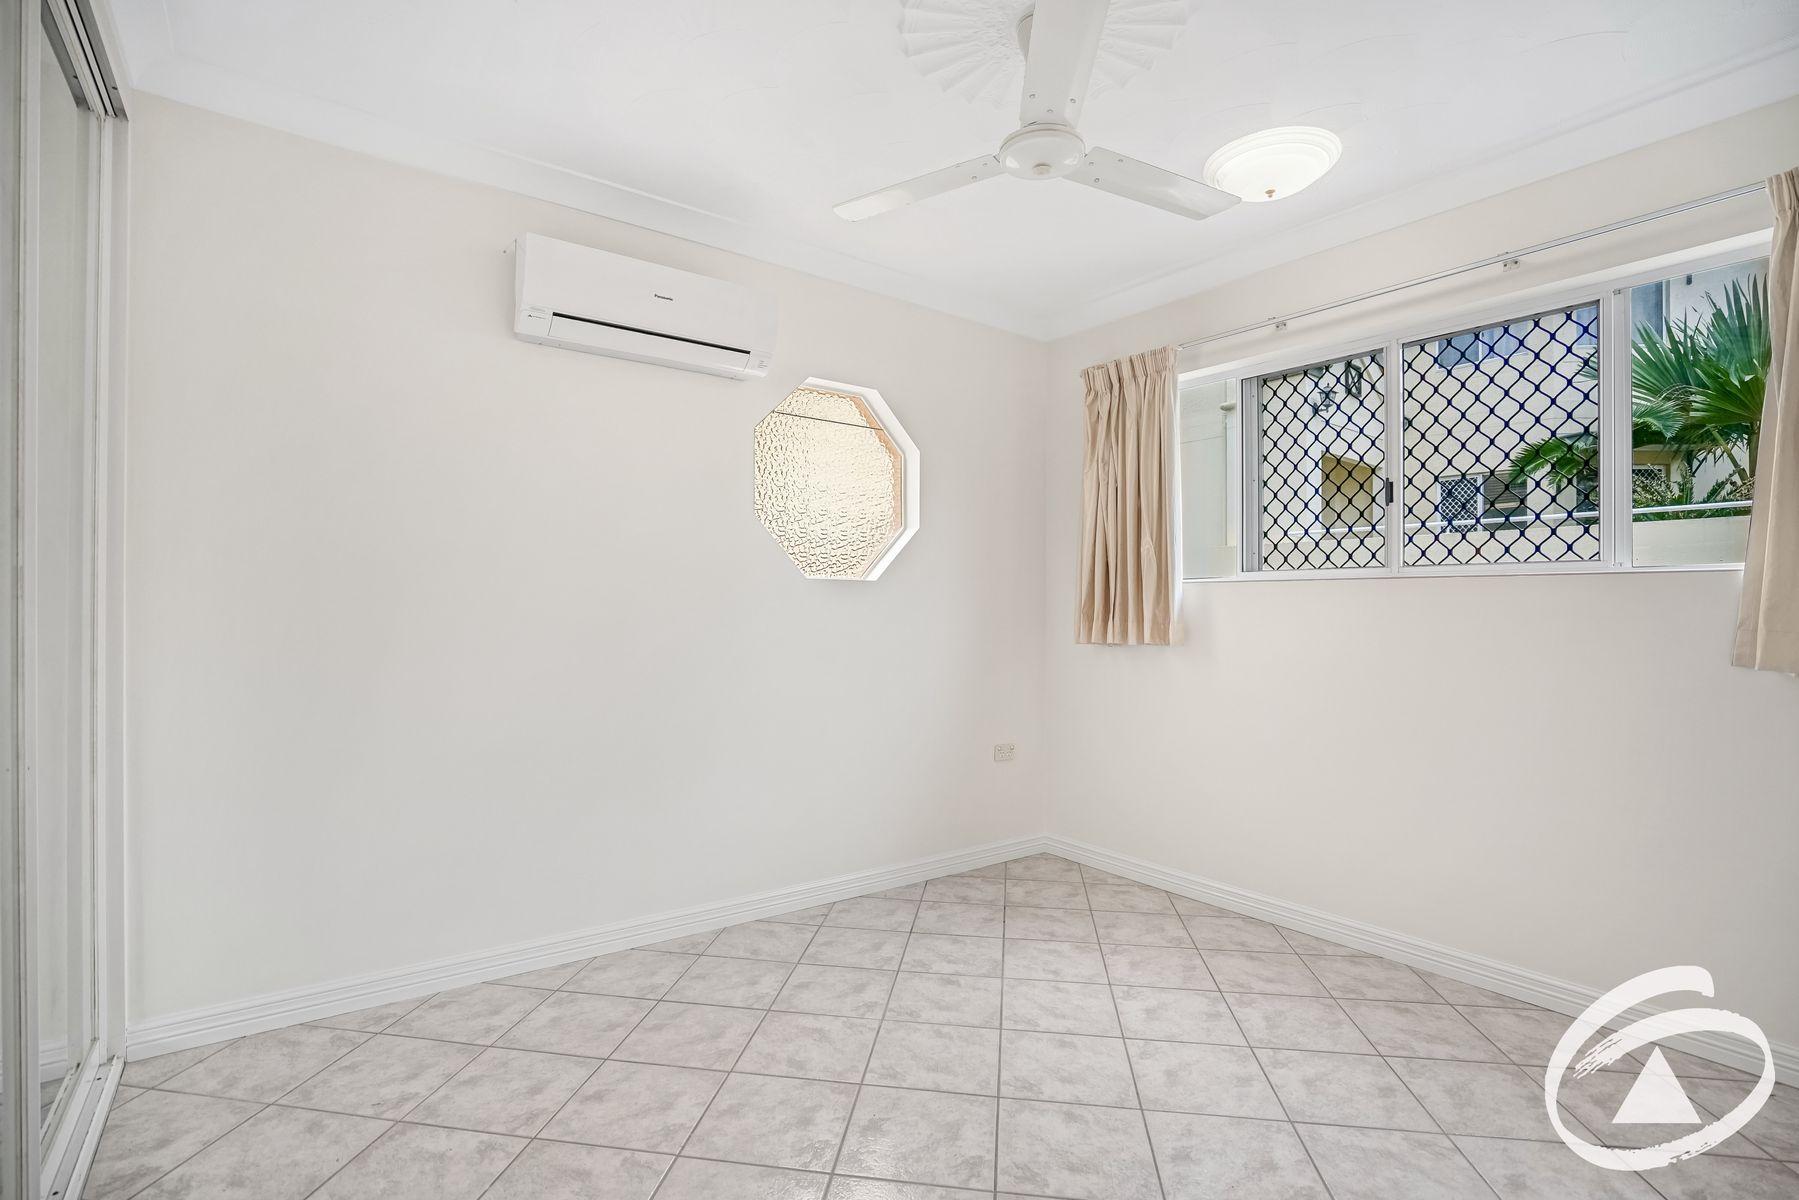 1/23 Digger Street, Cairns North, QLD 4870